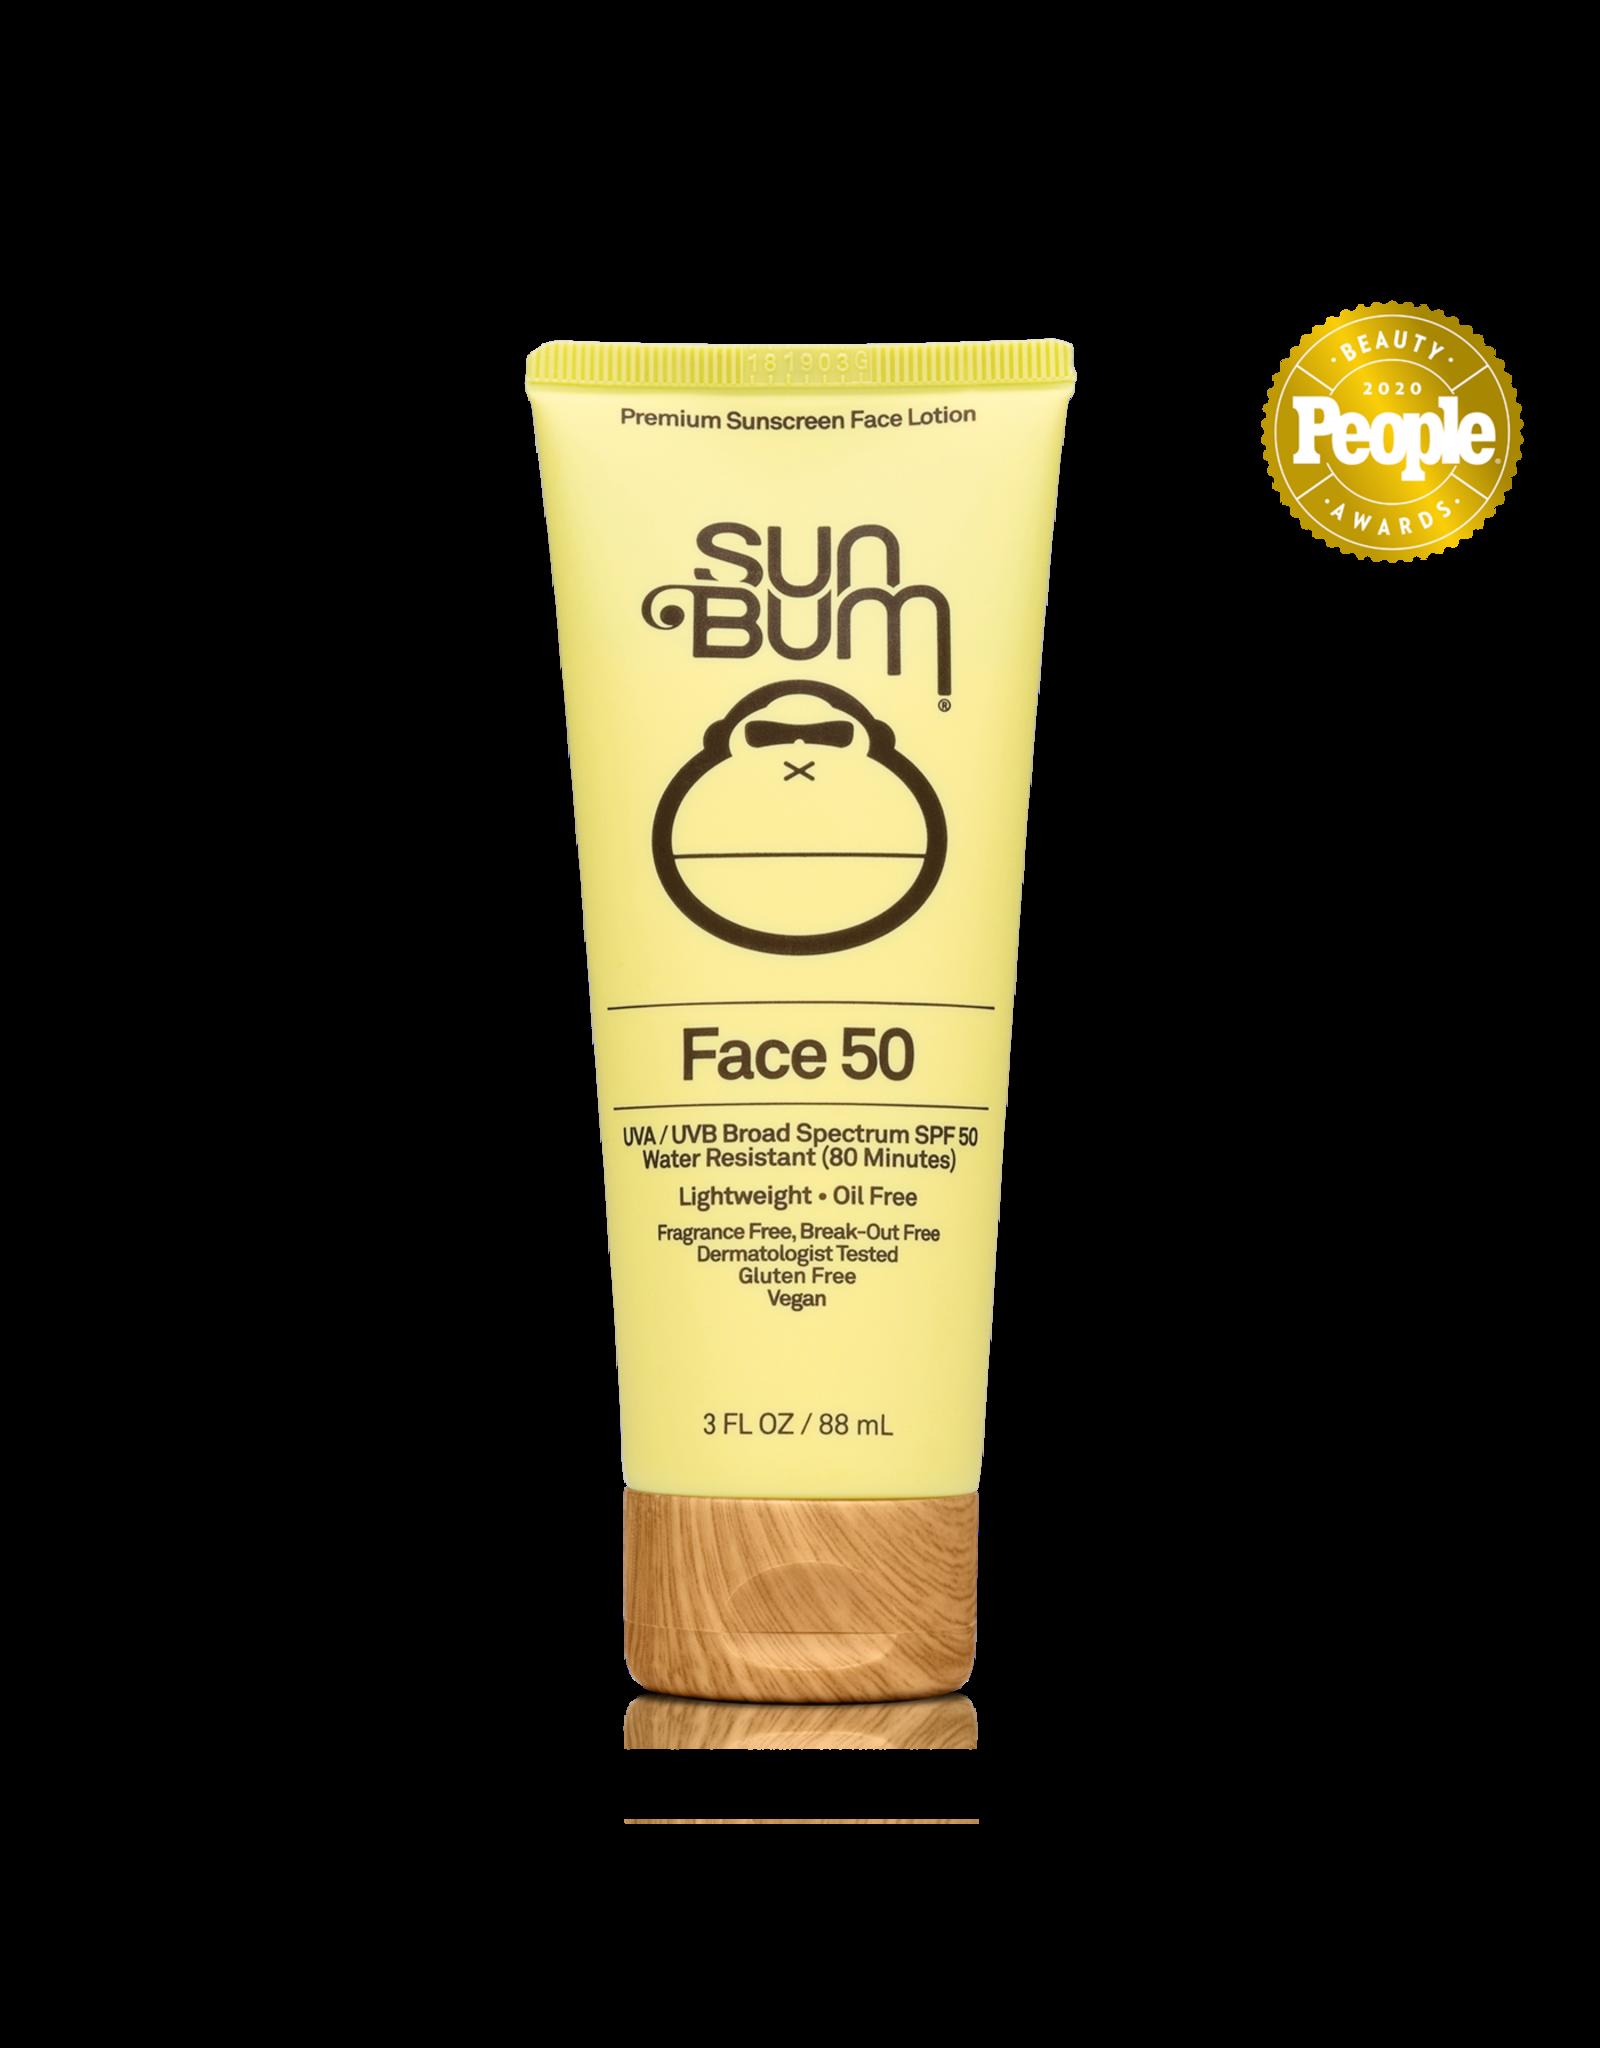 SUN BUM Face Lotion - SPF 50